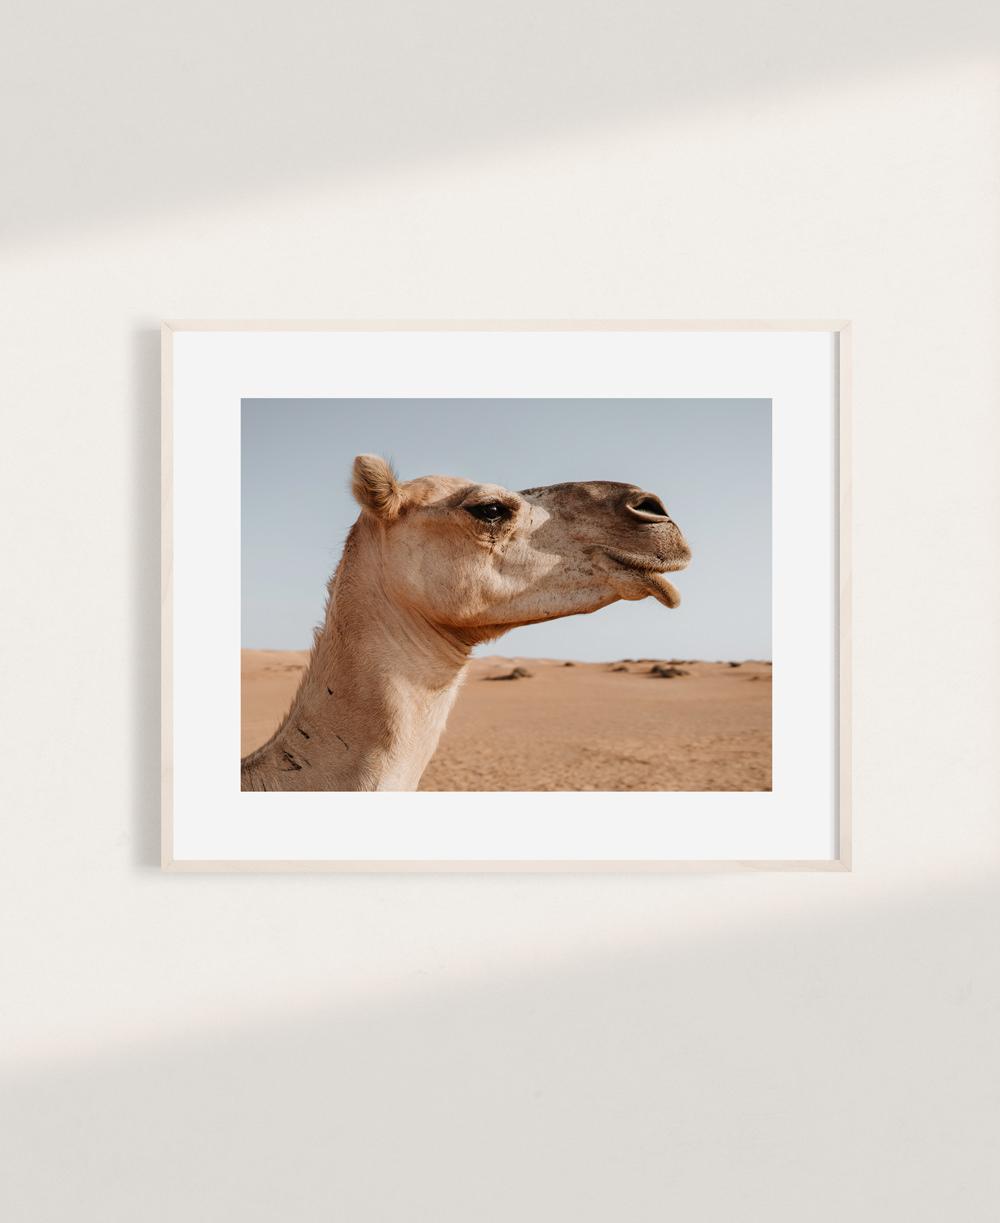 nicischwab-prints-006-camel